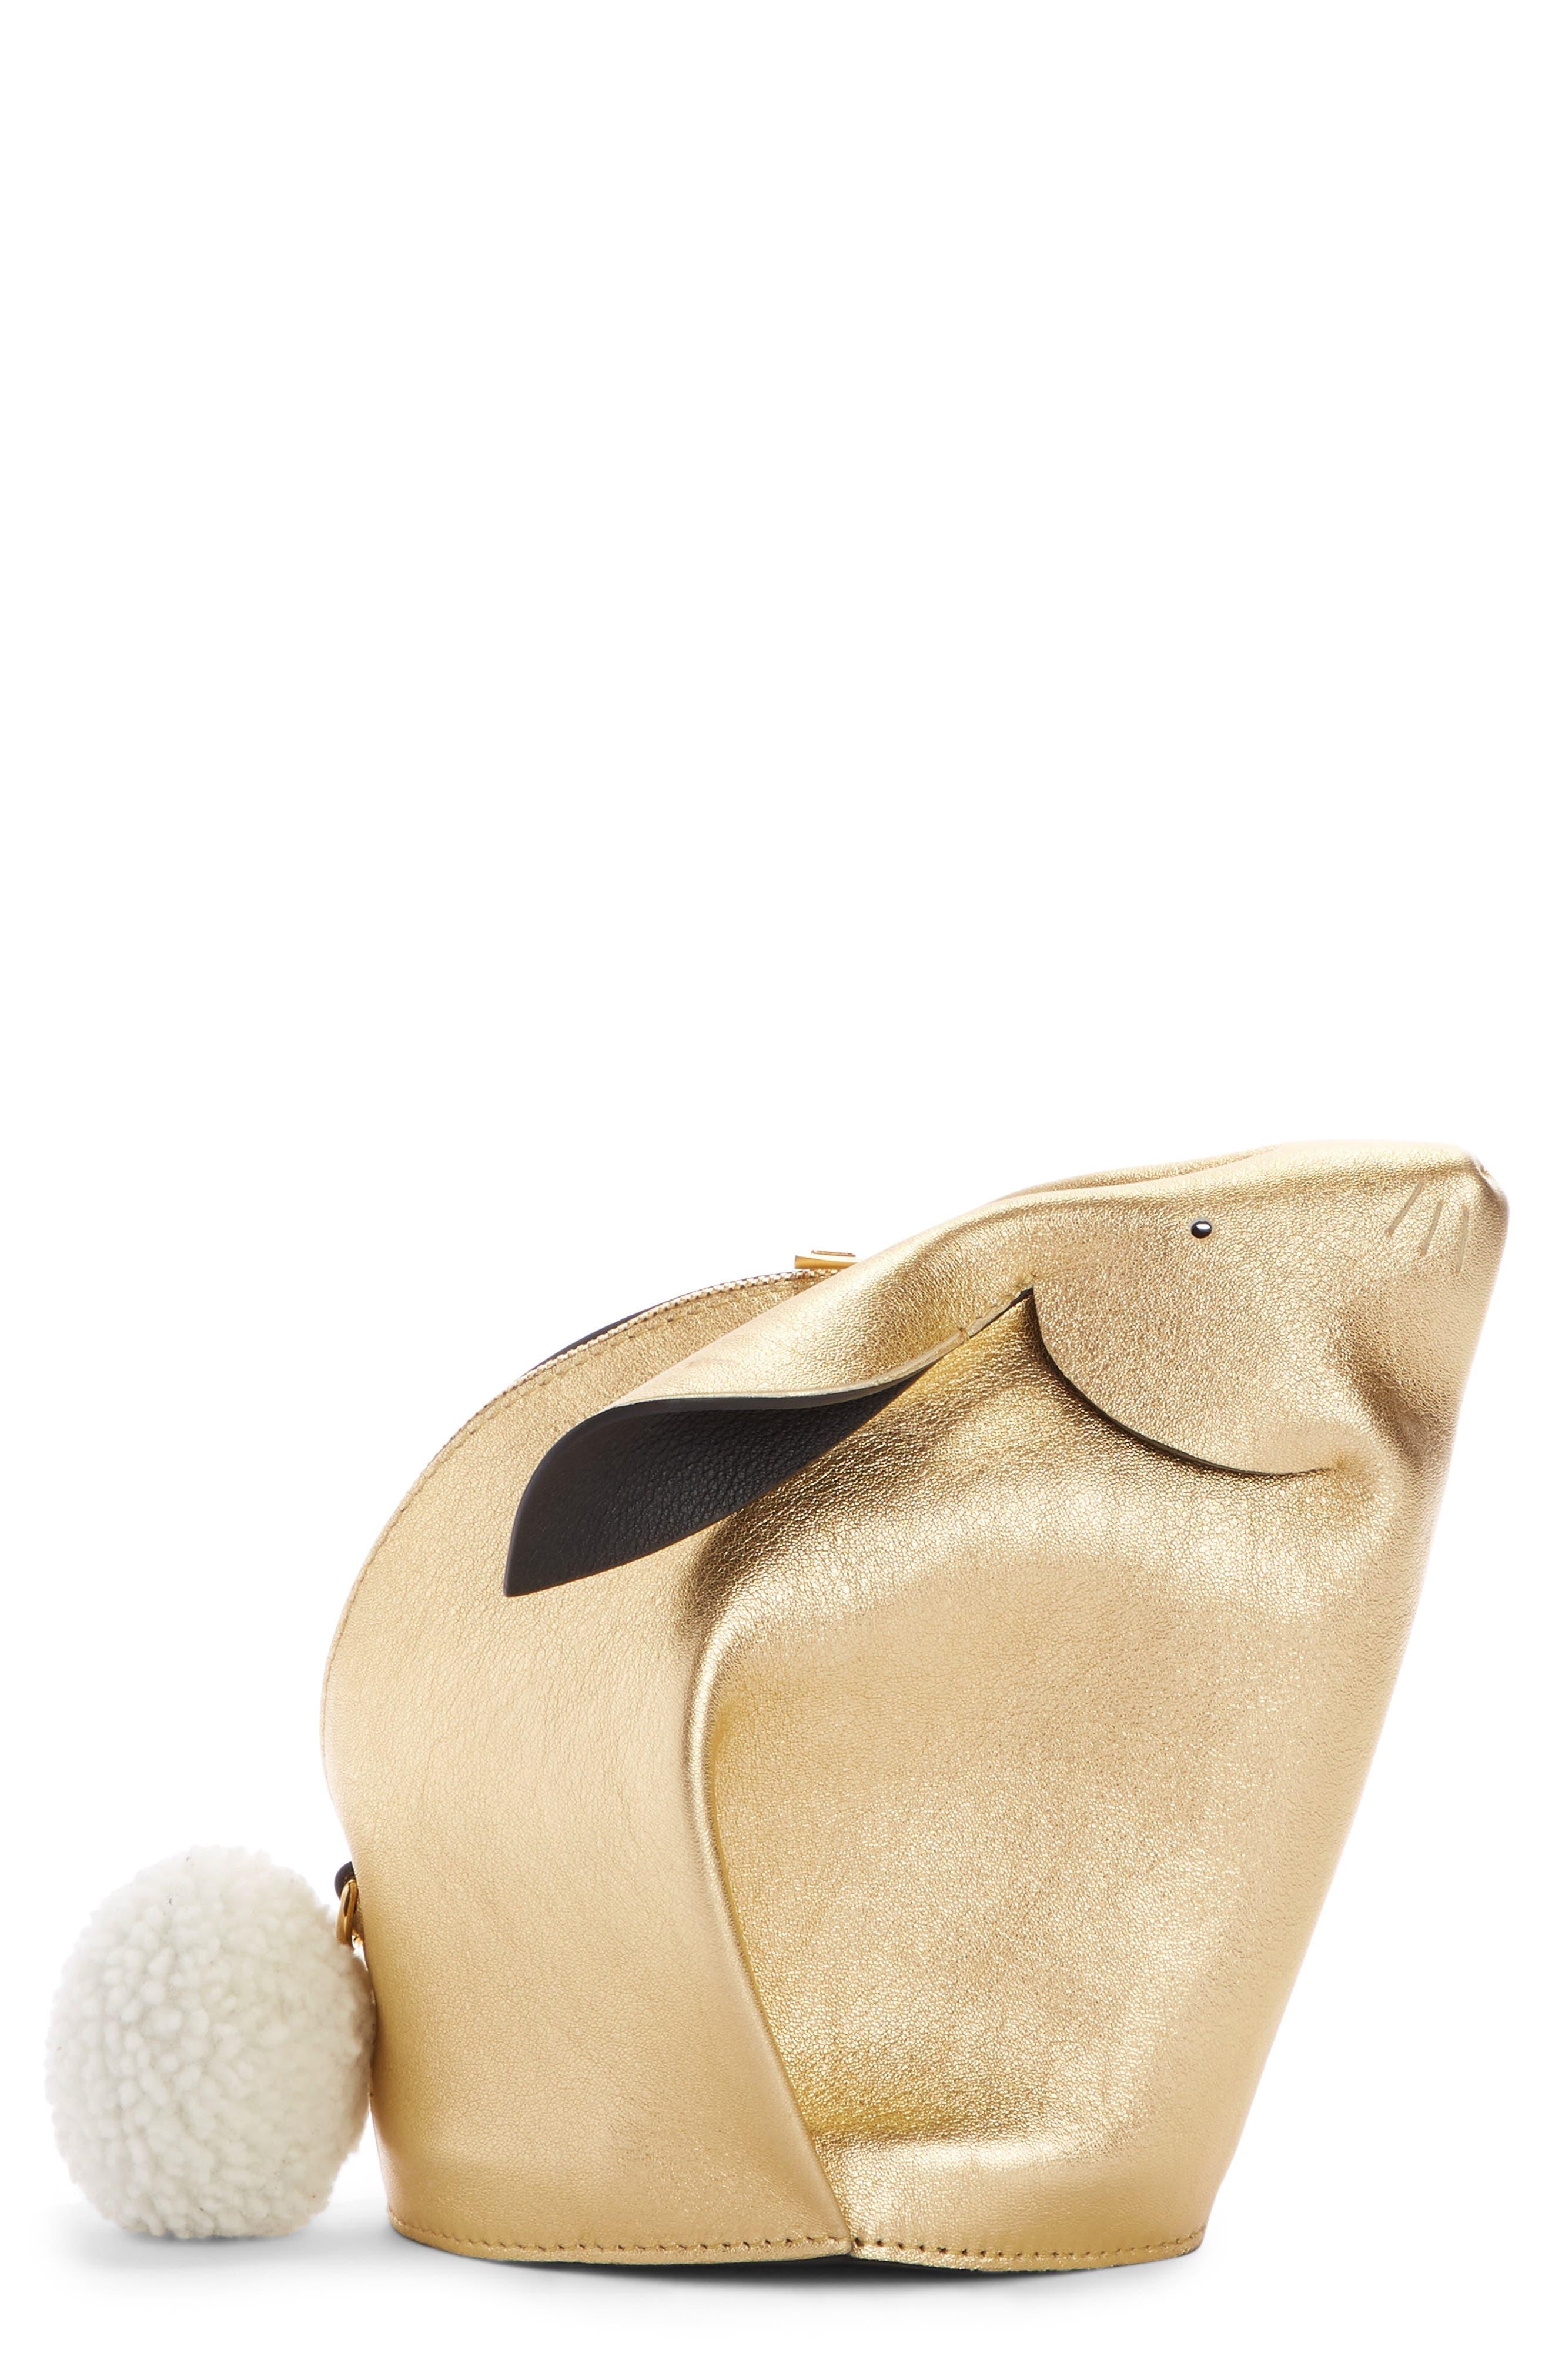 Mini Bunny Metallic Leather Crossbody Bag with Genuine Shearling Trim,                             Main thumbnail 1, color,                             710